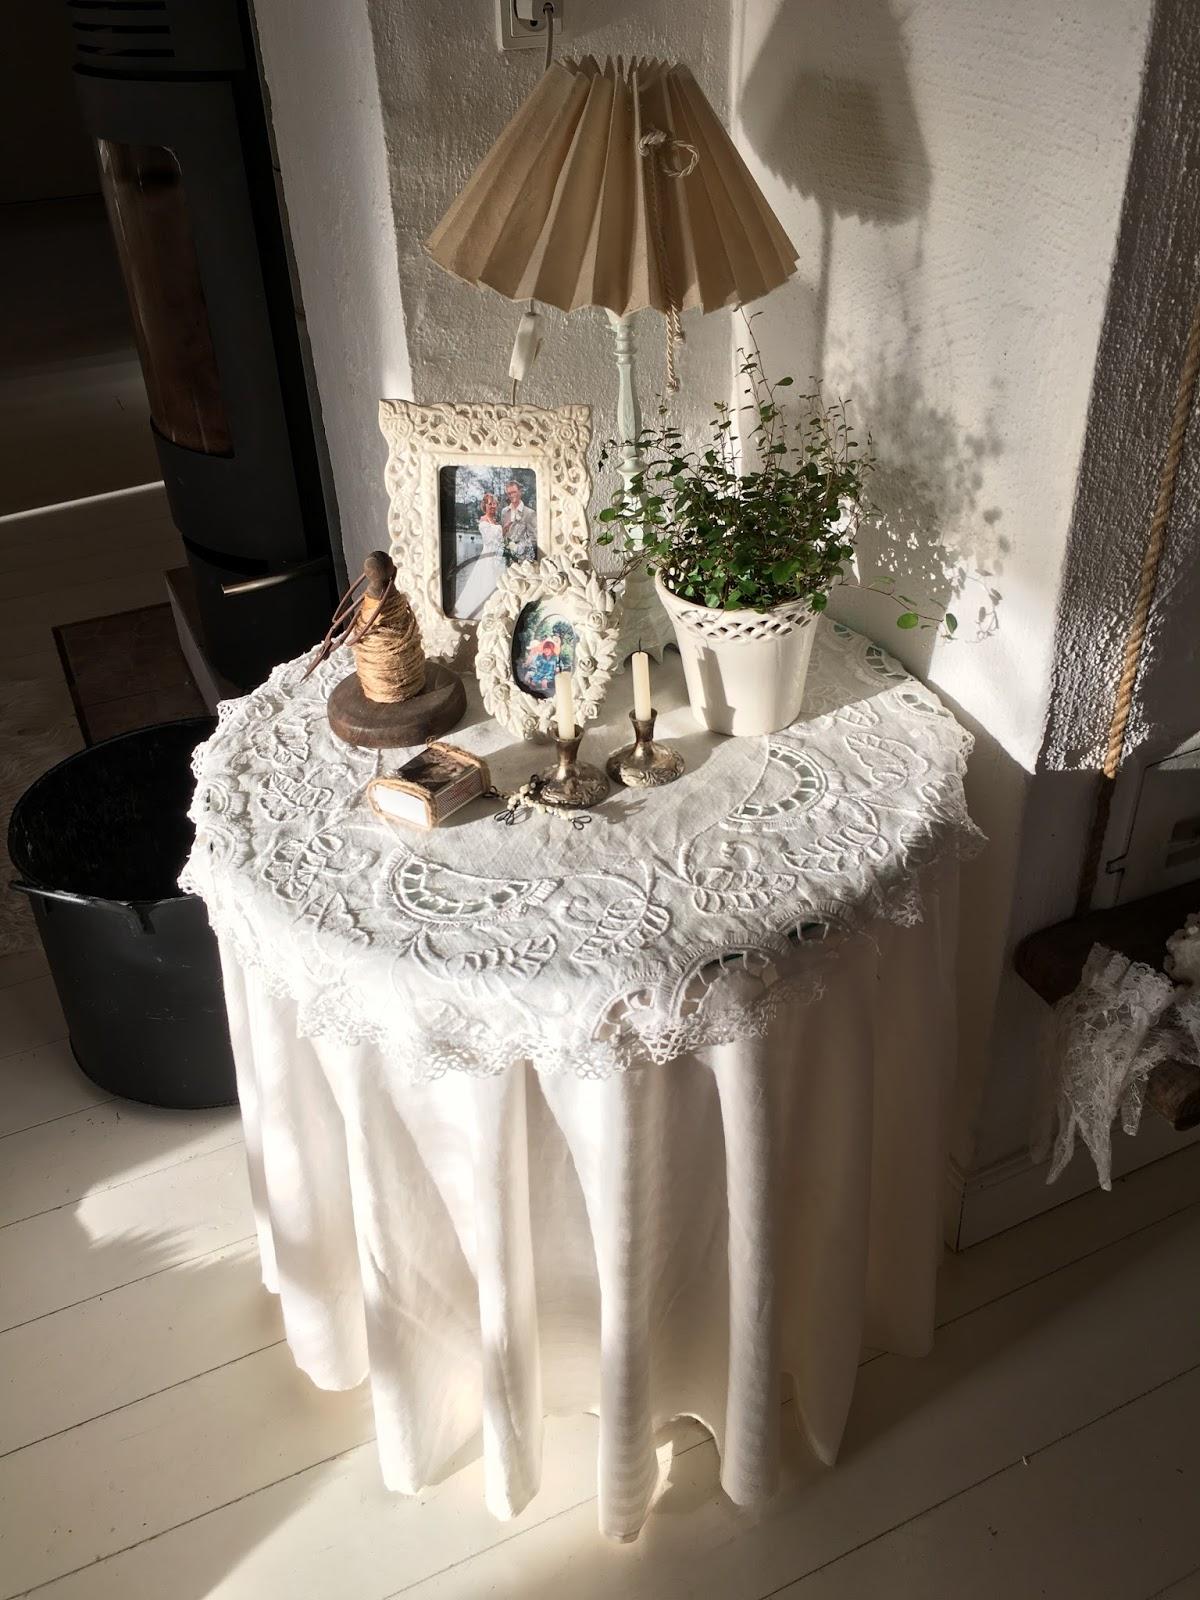 Frk Hall: Min stue